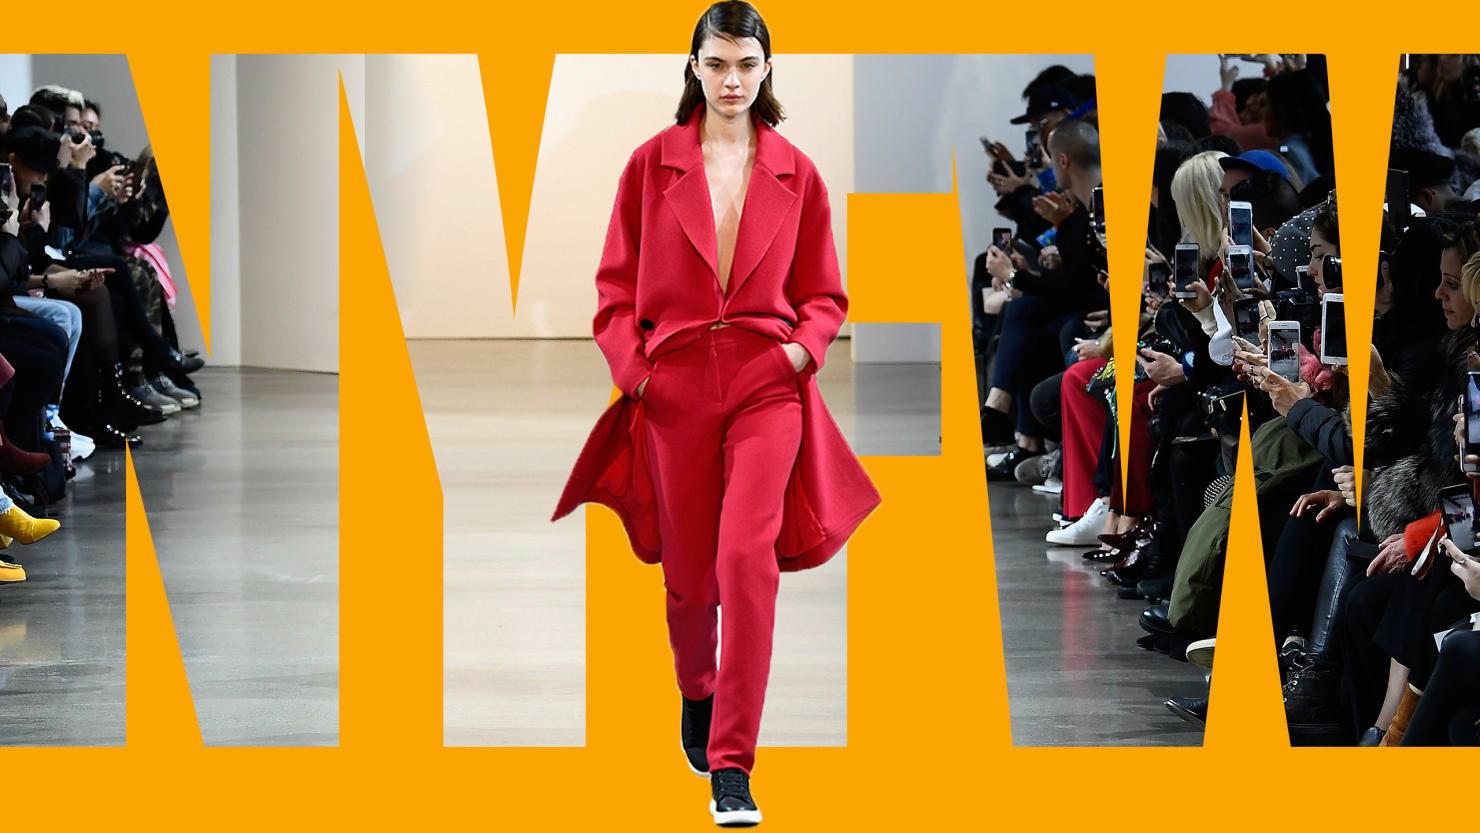 So Far New York Fashion Week Provides Escape Not Politics